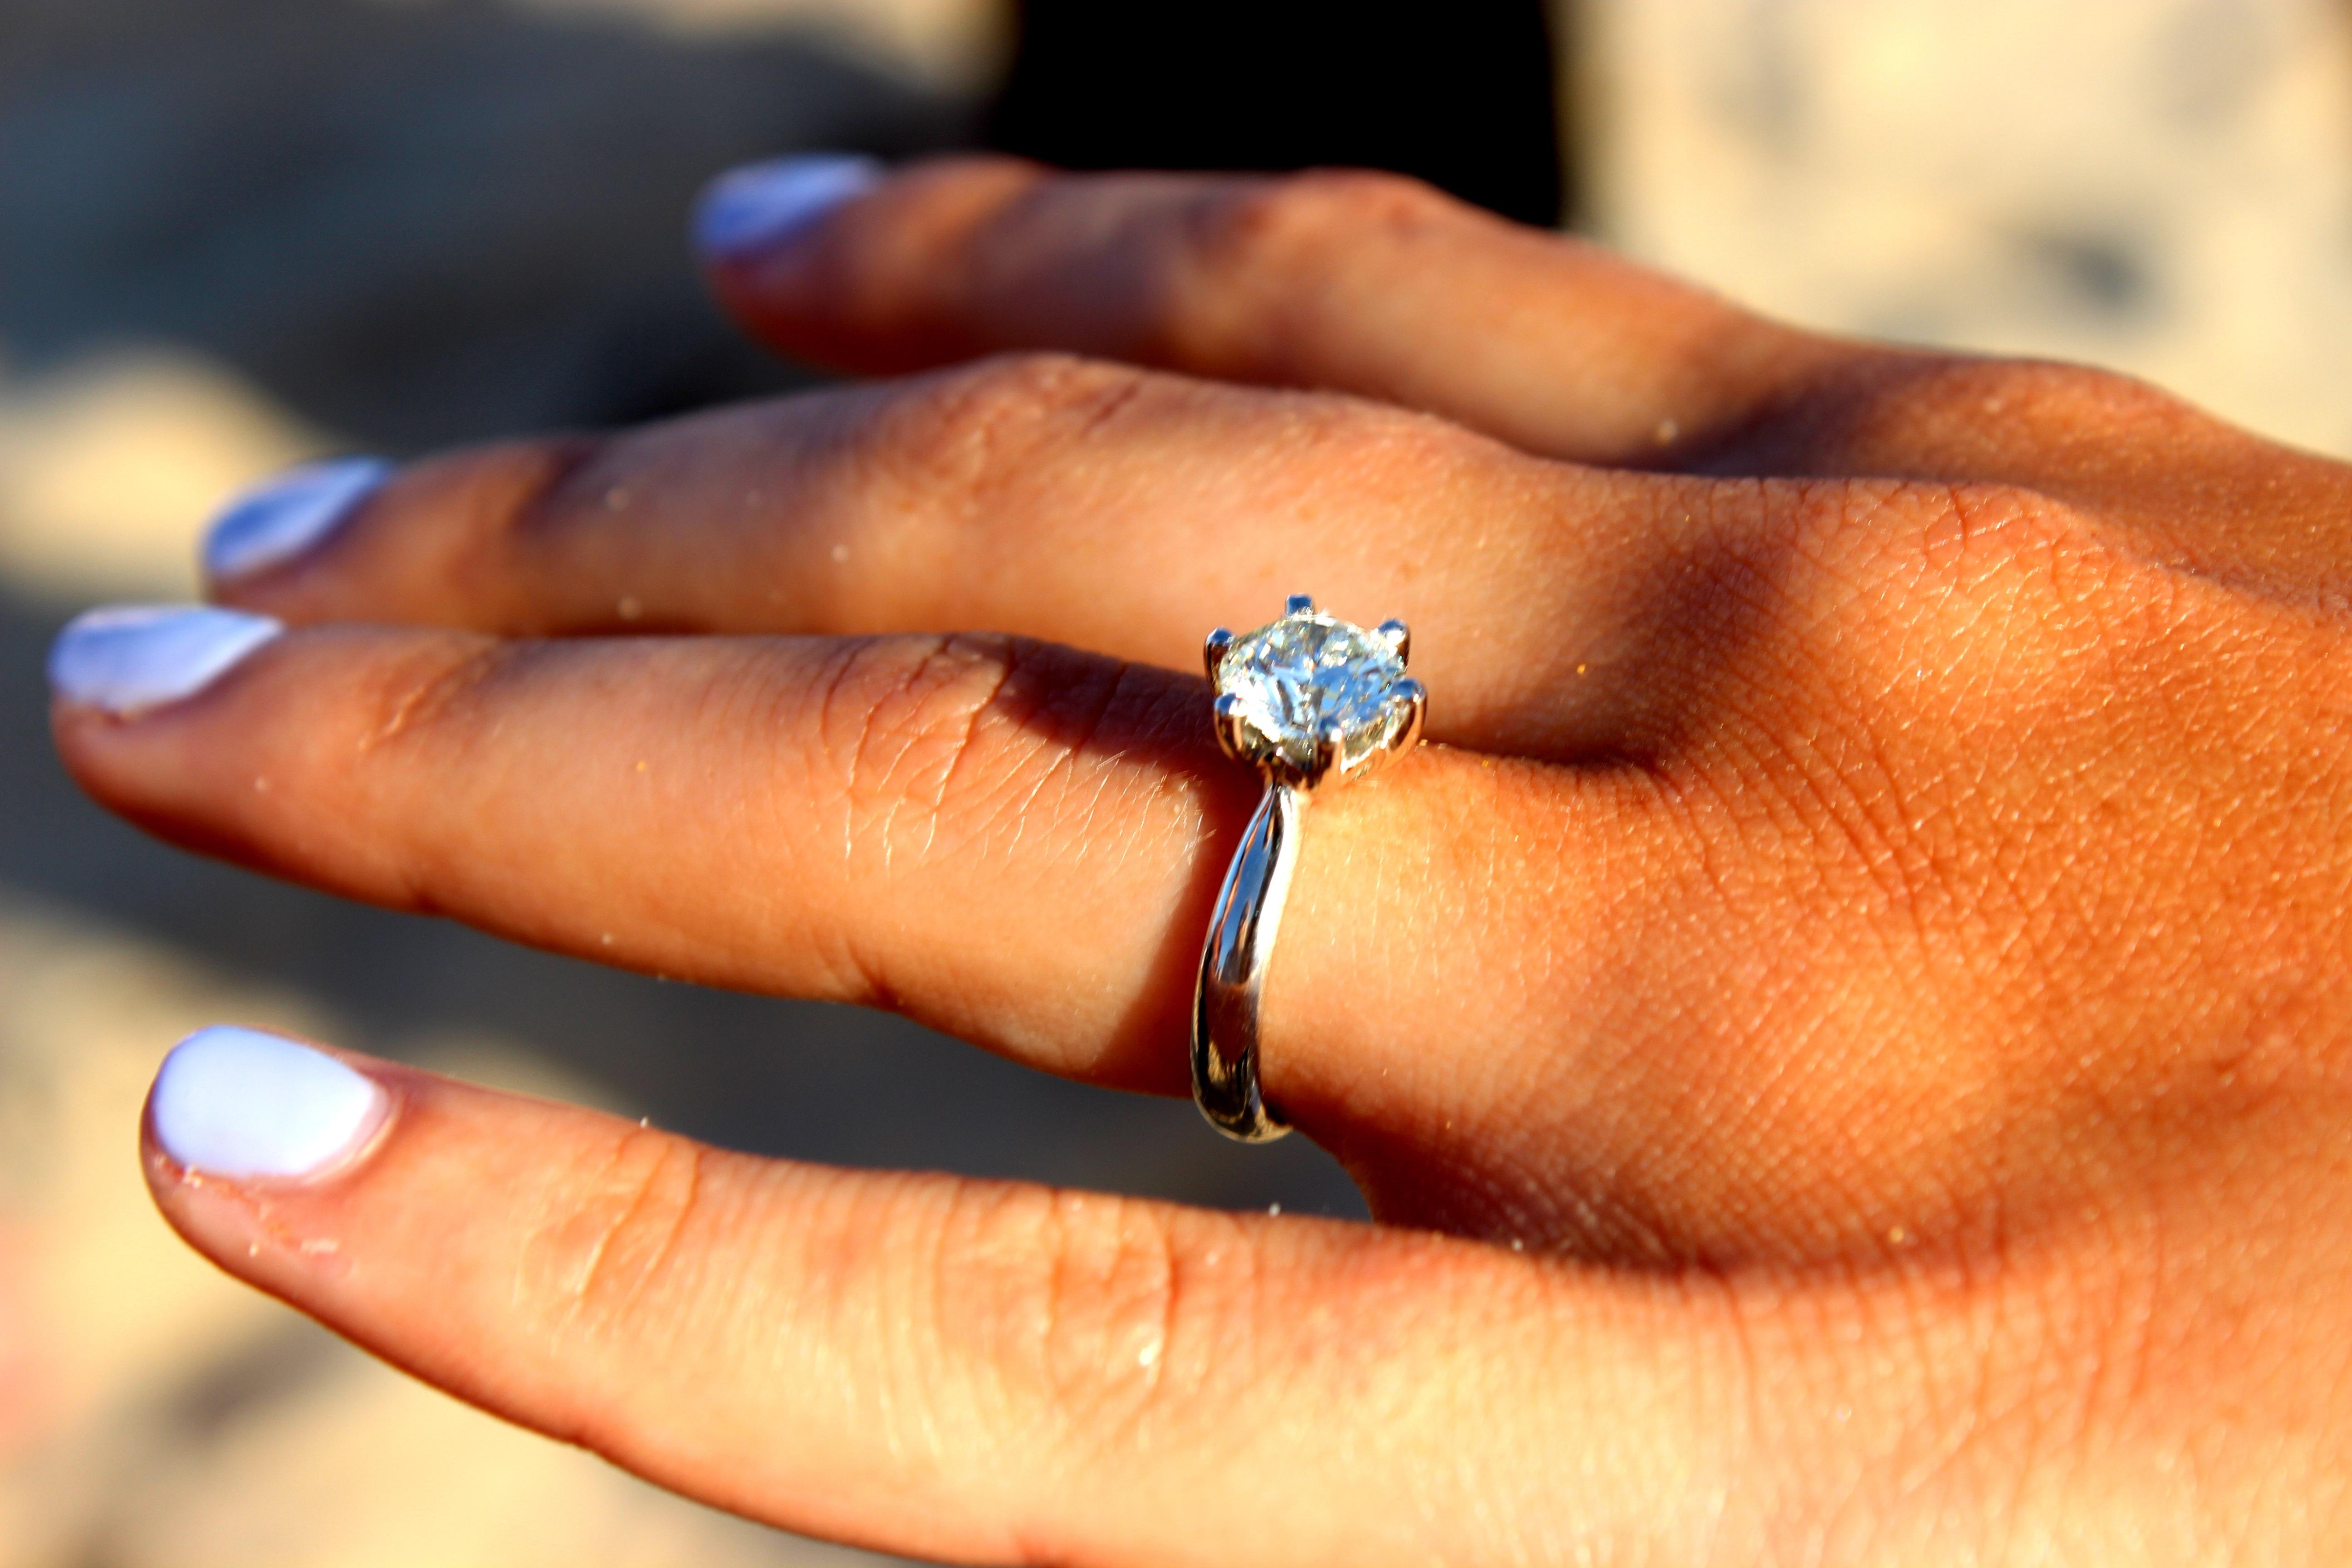 Fotos gratis : mano, mujer, celebracion, amor, dedo, romance ...